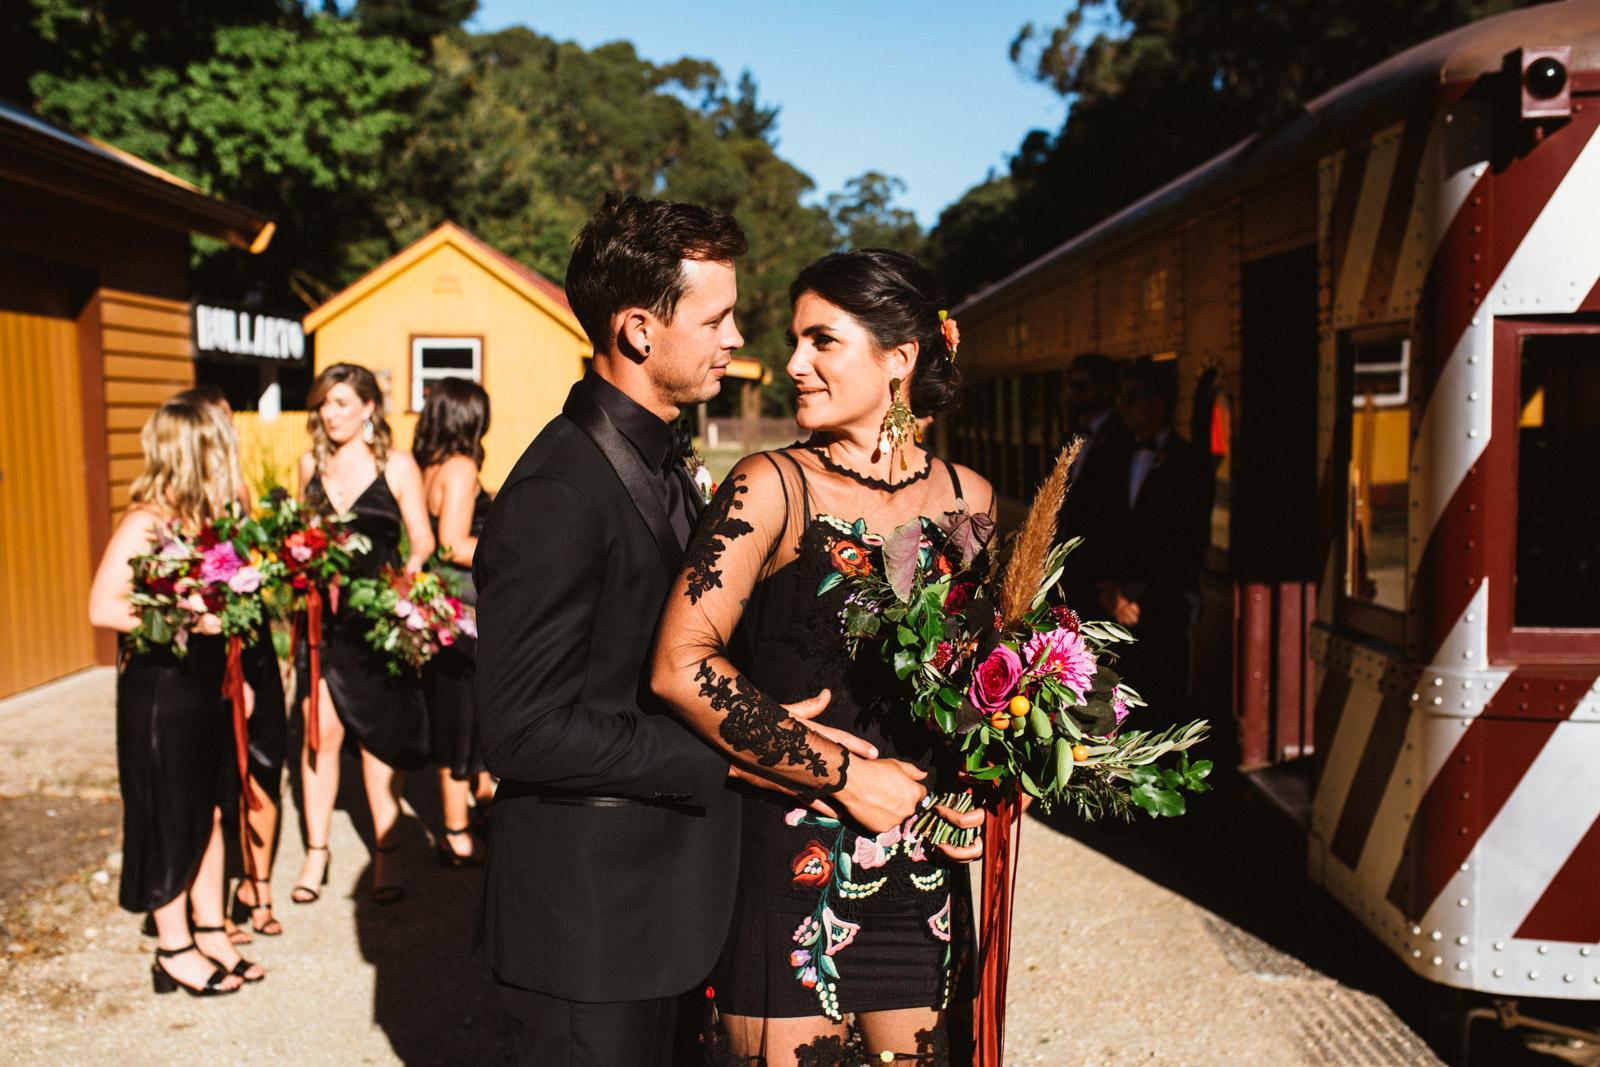 ZD-Melbourne Wedding Photographer-Dean Raphael-84.jpg